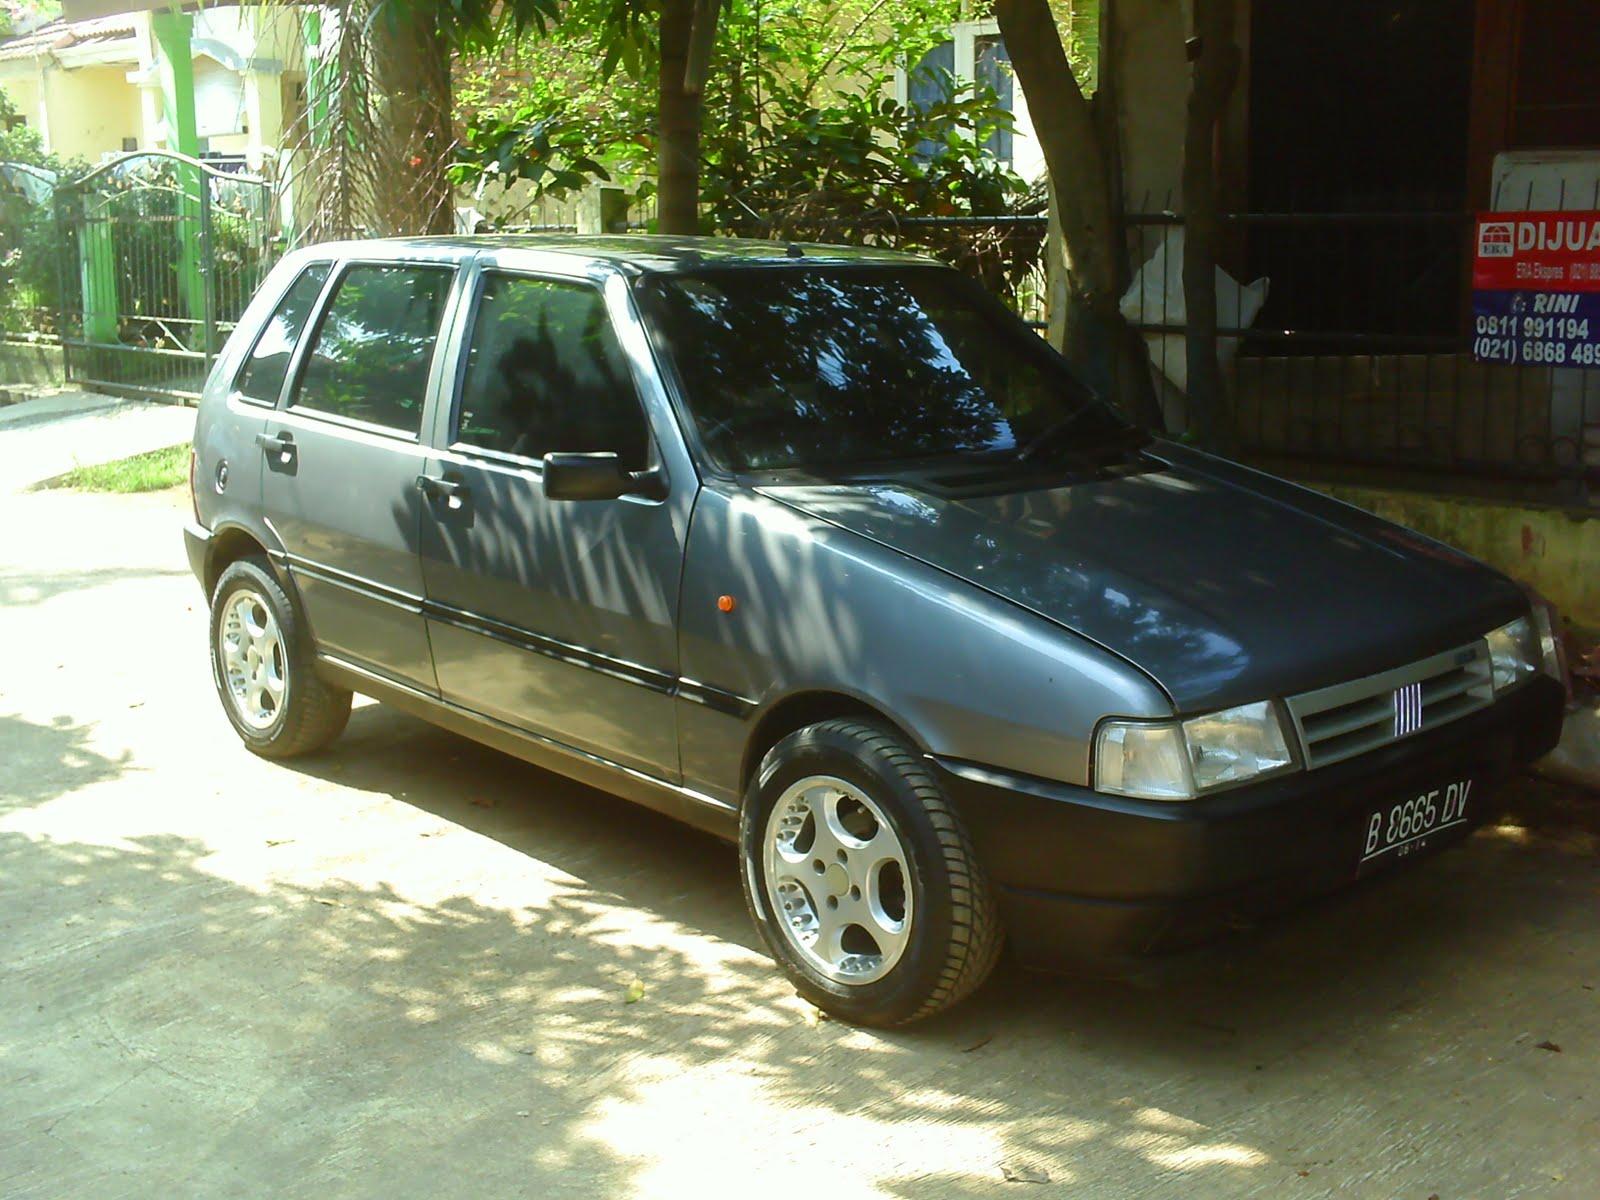 Wnwayudi: Jual Mobil Fiat Uno 2 Th 1994